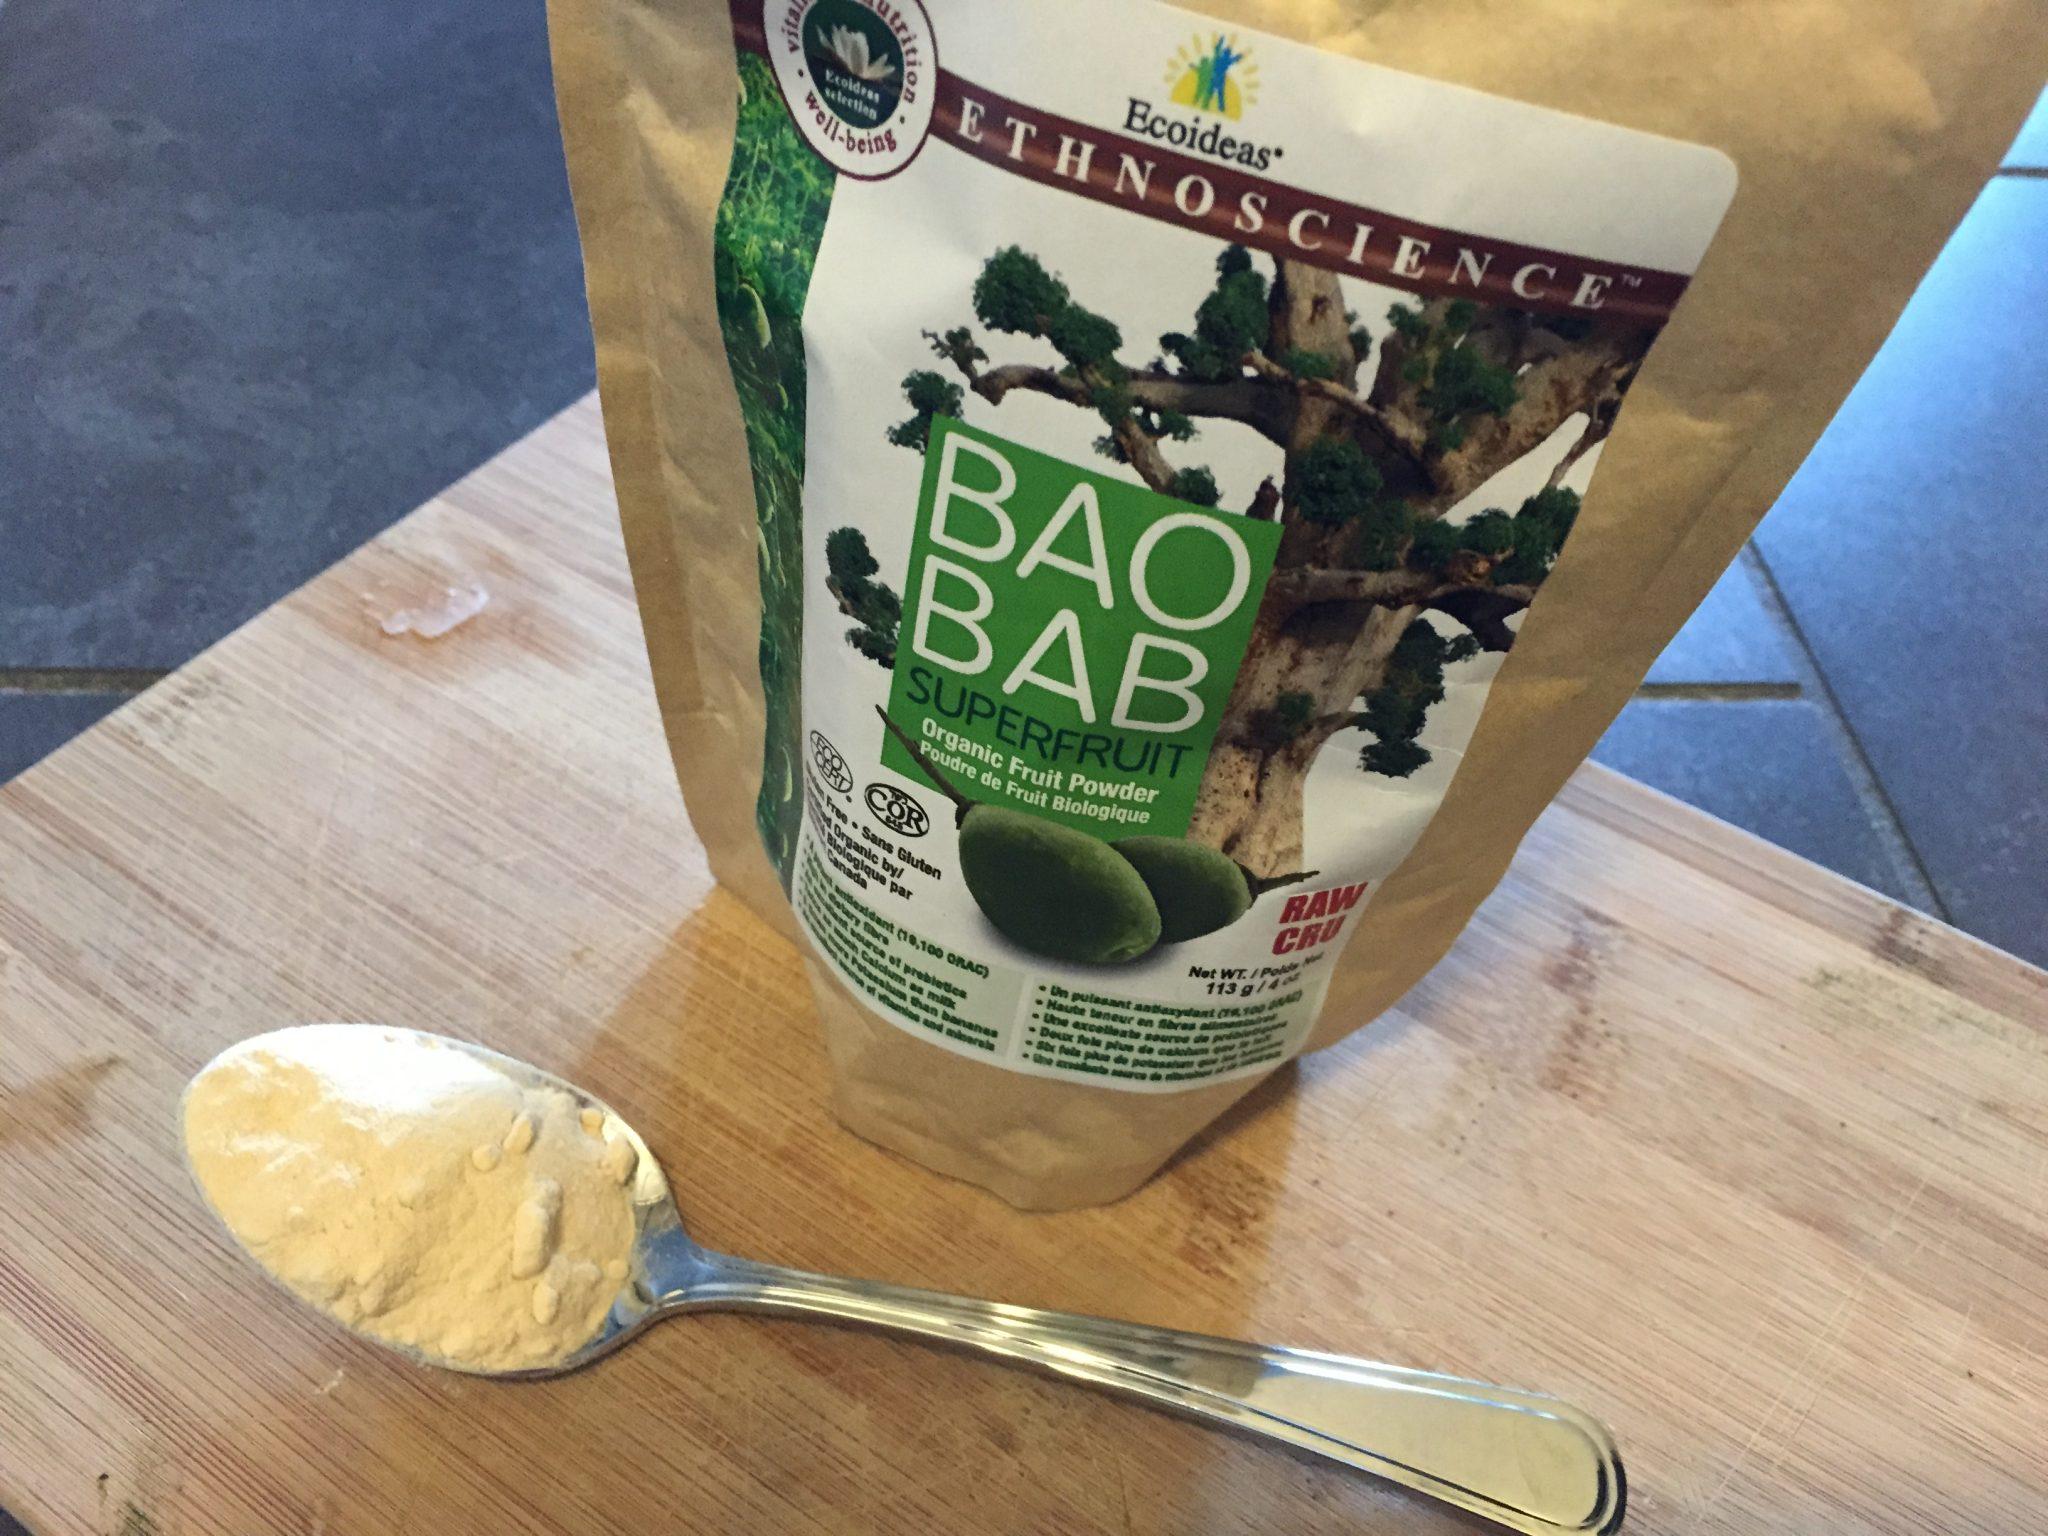 7 Health Benefits of African Superfruit Baobab